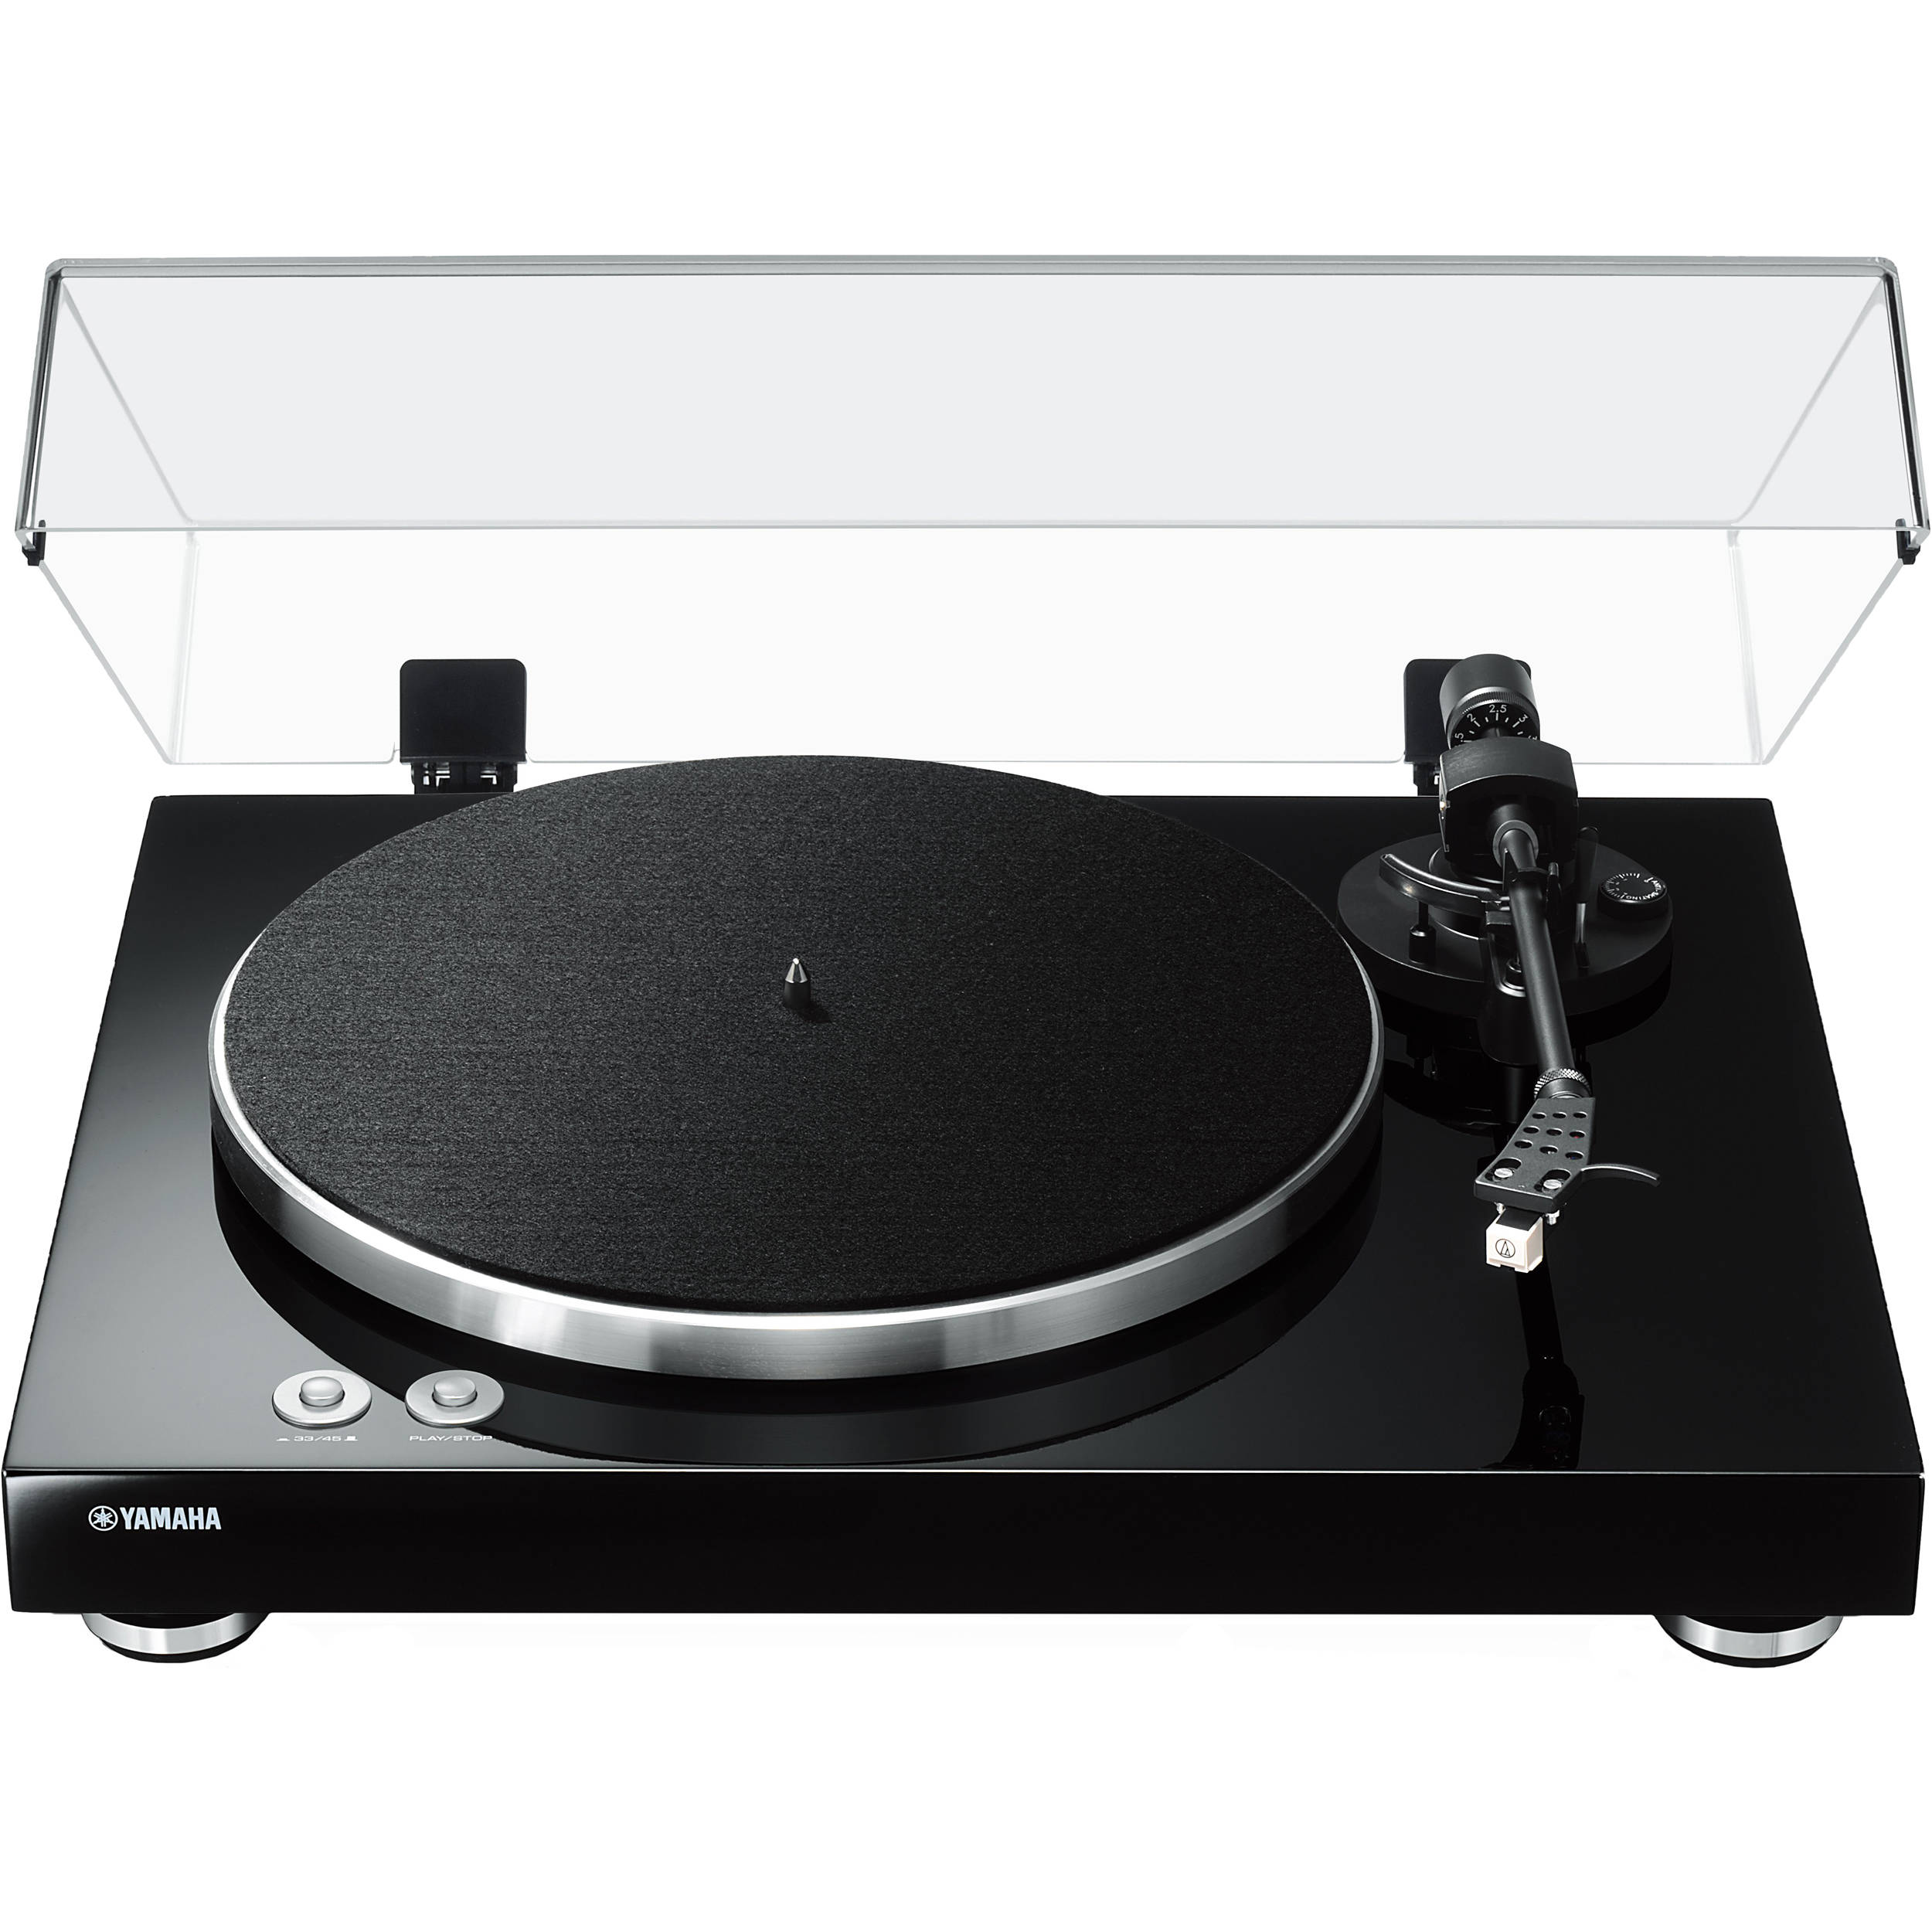 Gentil Yamaha TT S303 Stereo Turntable (Piano Black)